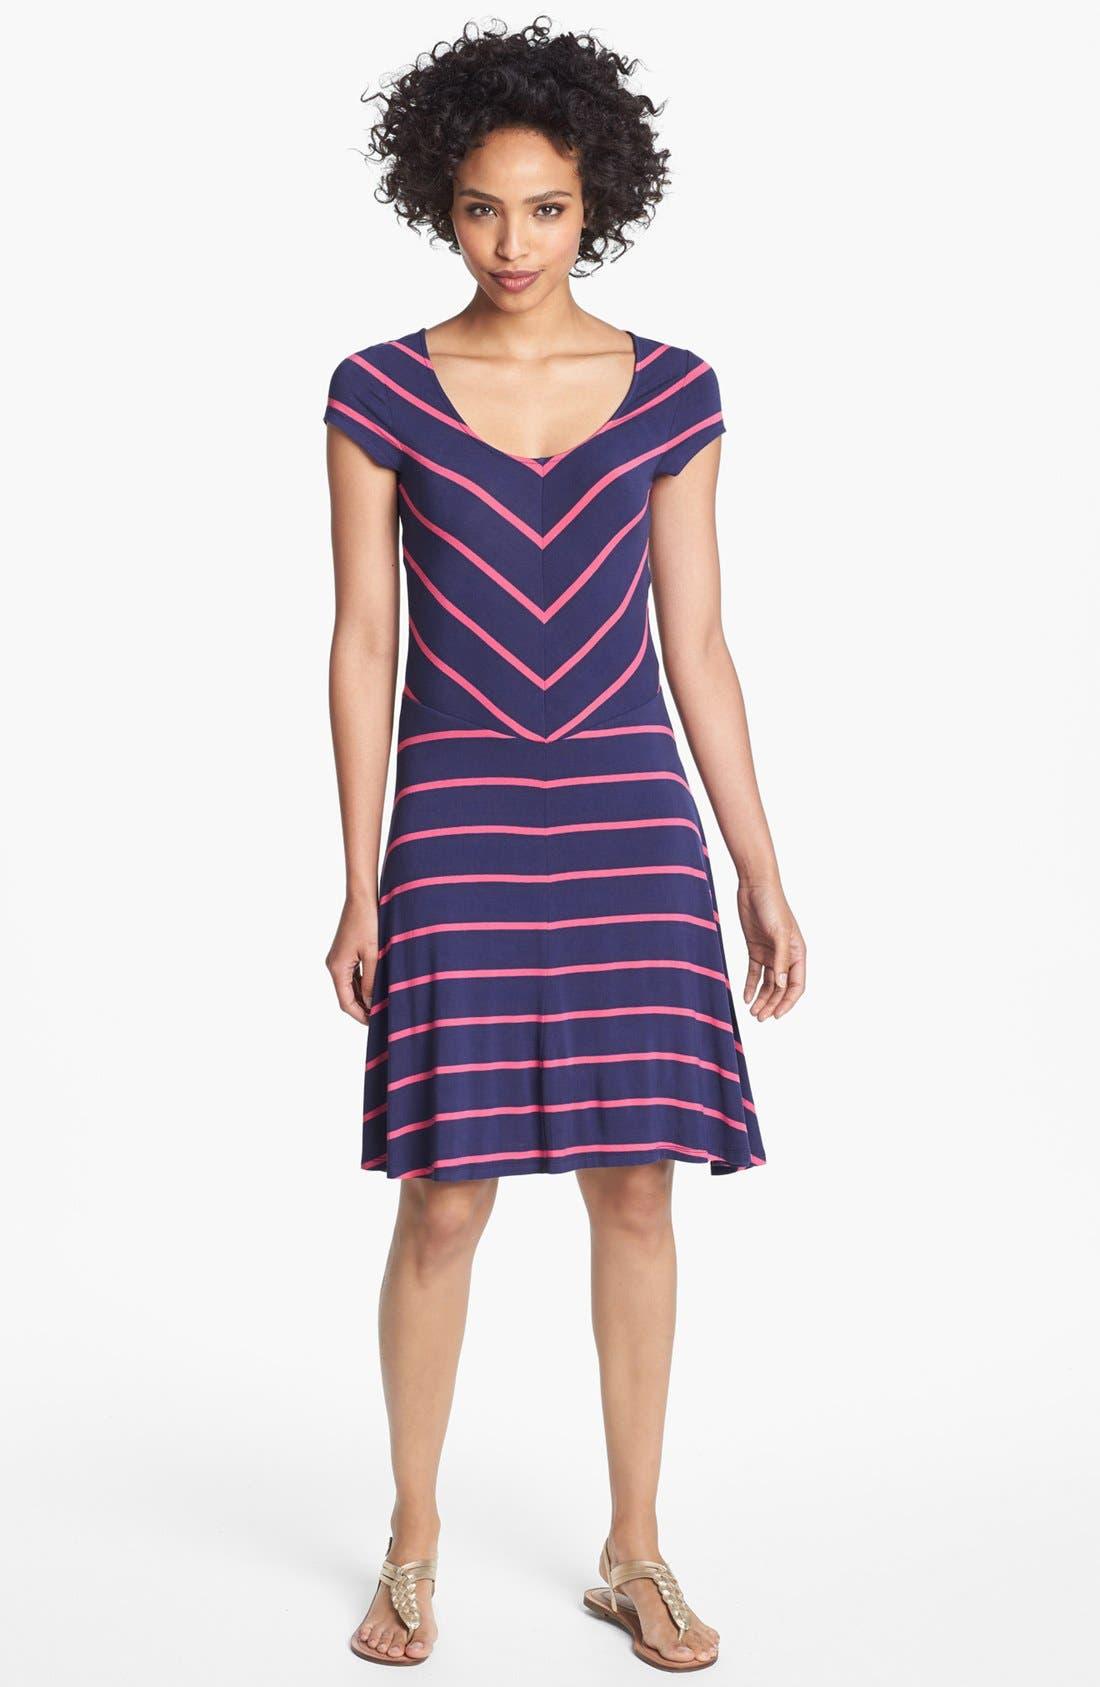 Alternate Image 1 Selected - Felicity & Coco Stripe Jersey Dress (Regular & Petite) (Nordstrom Exclusive)